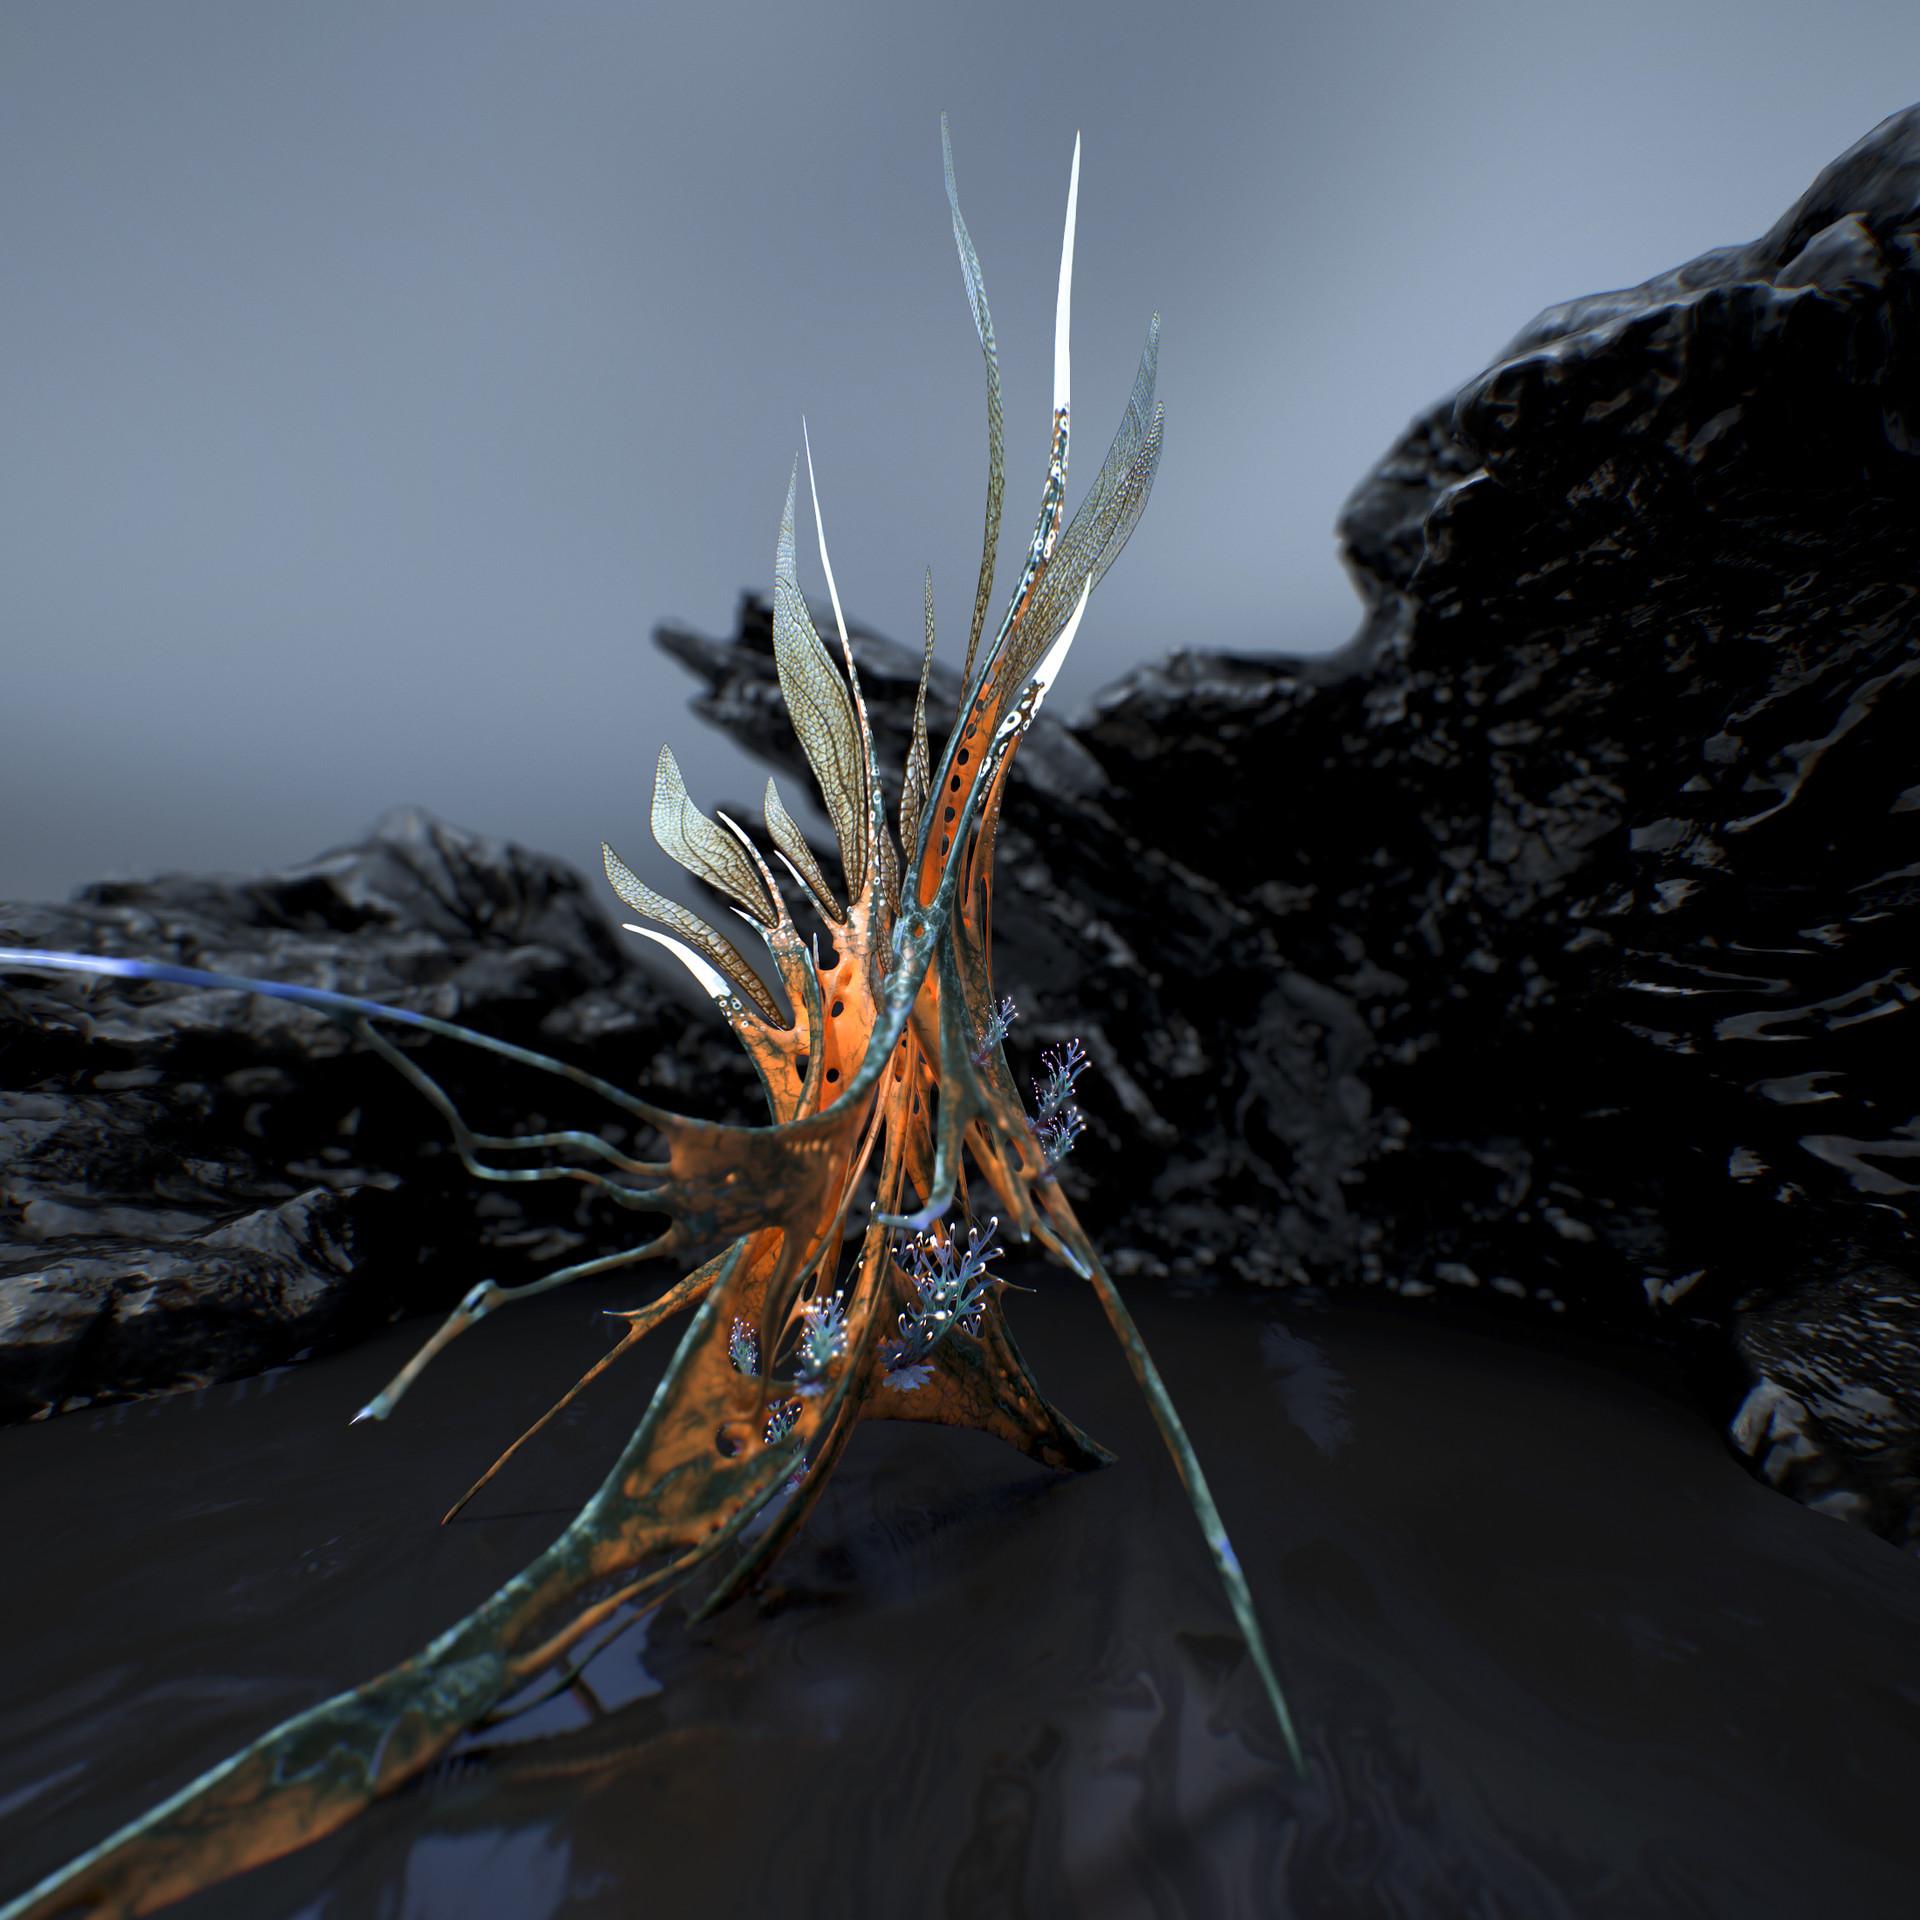 Johan de leenheer alien fern misota spletinus25